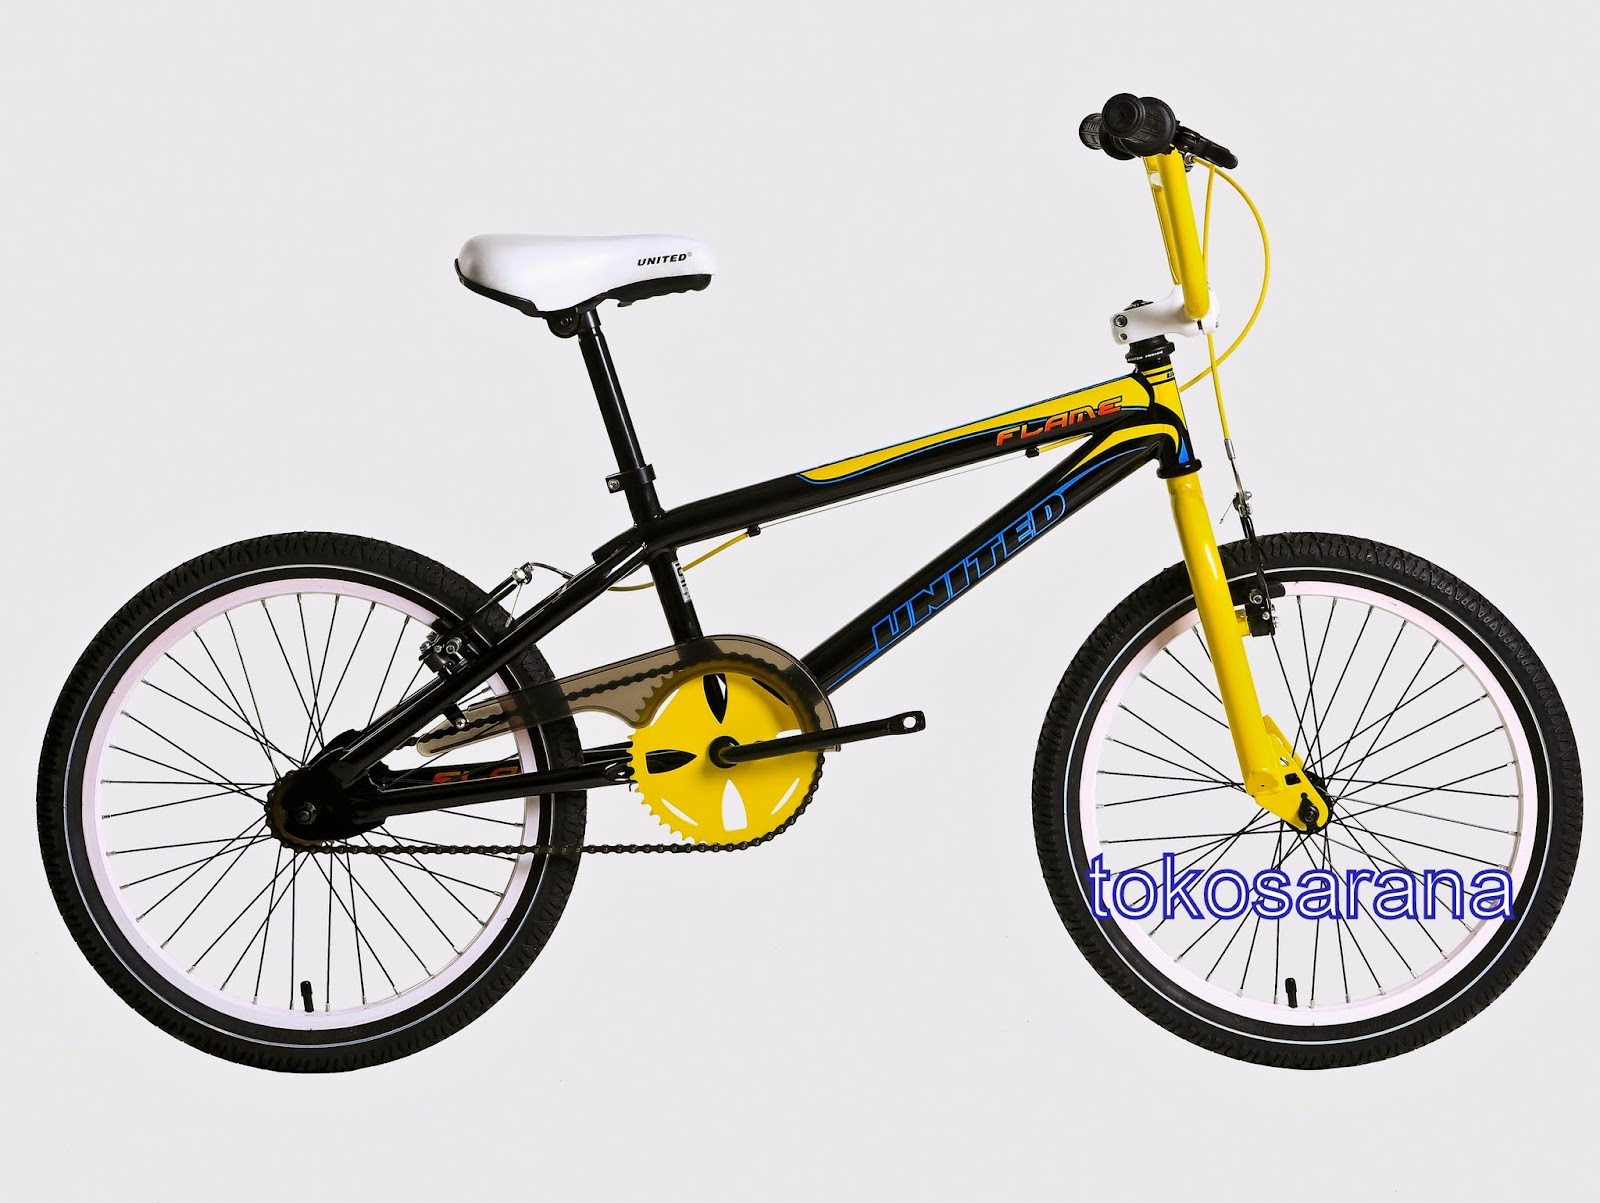 TokosaranaTMJakarta Jatinegara Sepeda BMX UNITED FLAME 20 Inci